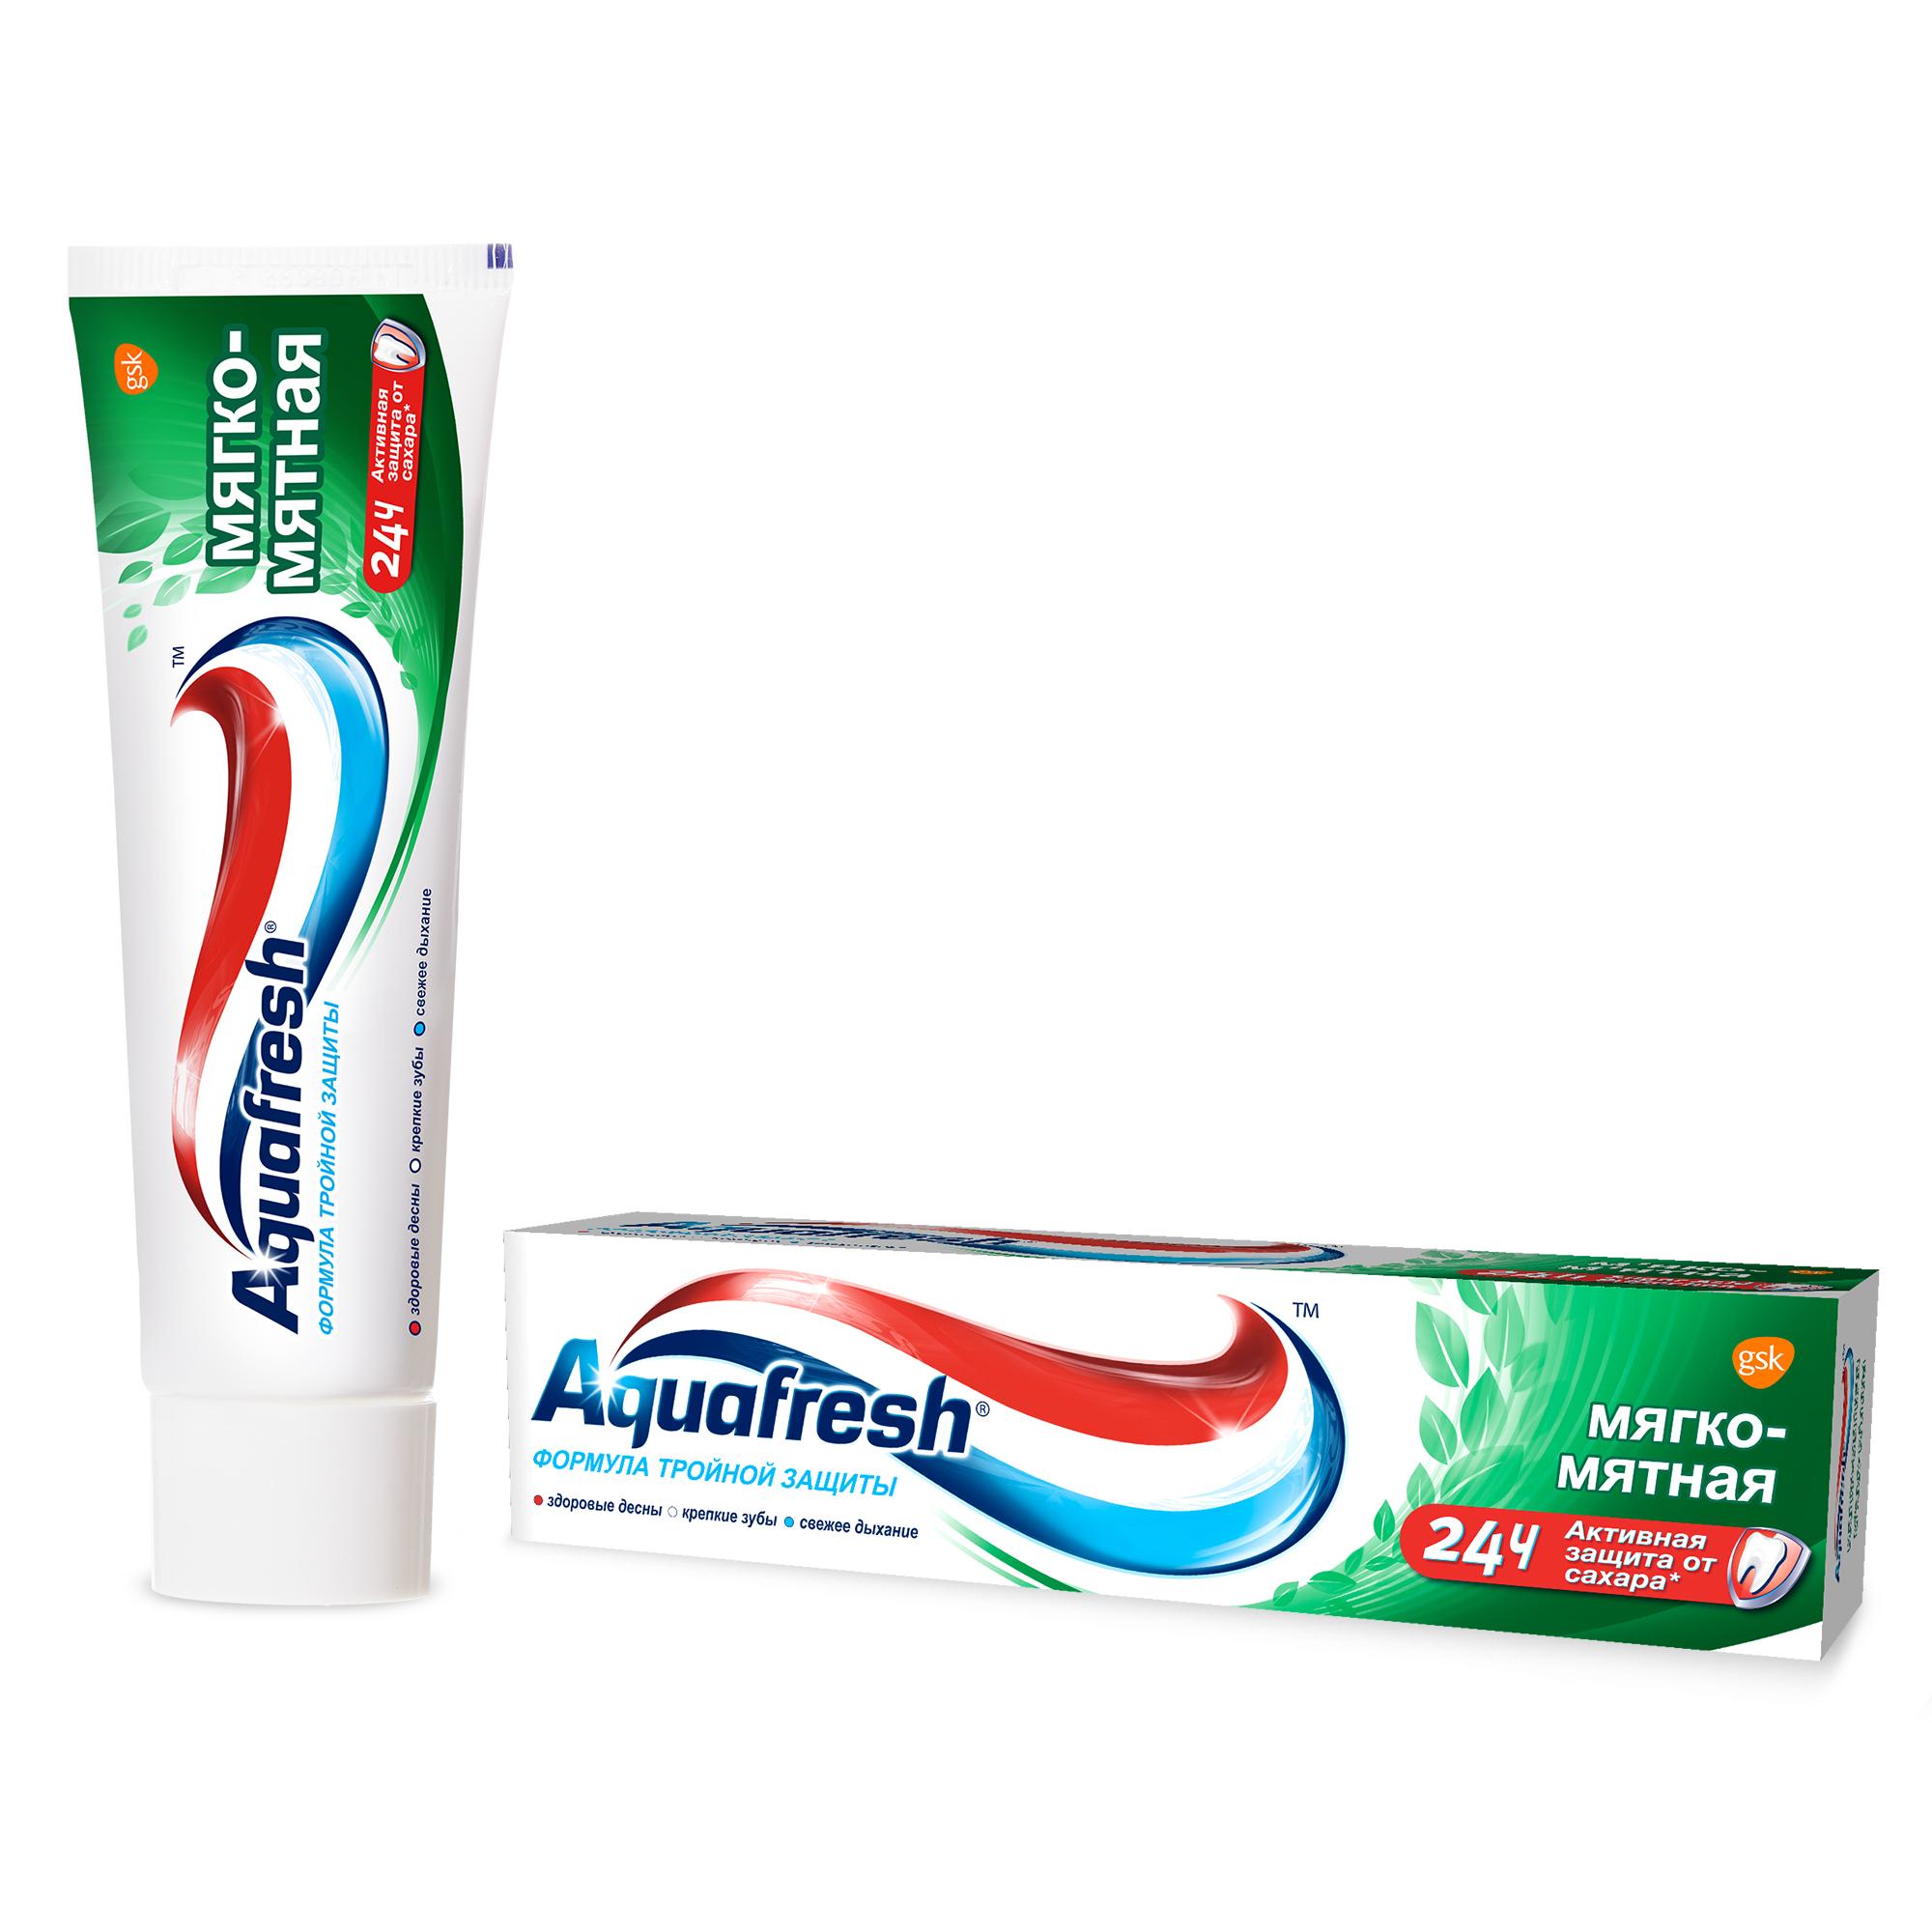 Зубная паста Aquafresh Тройная защита Мягко-мятная, 50 мл